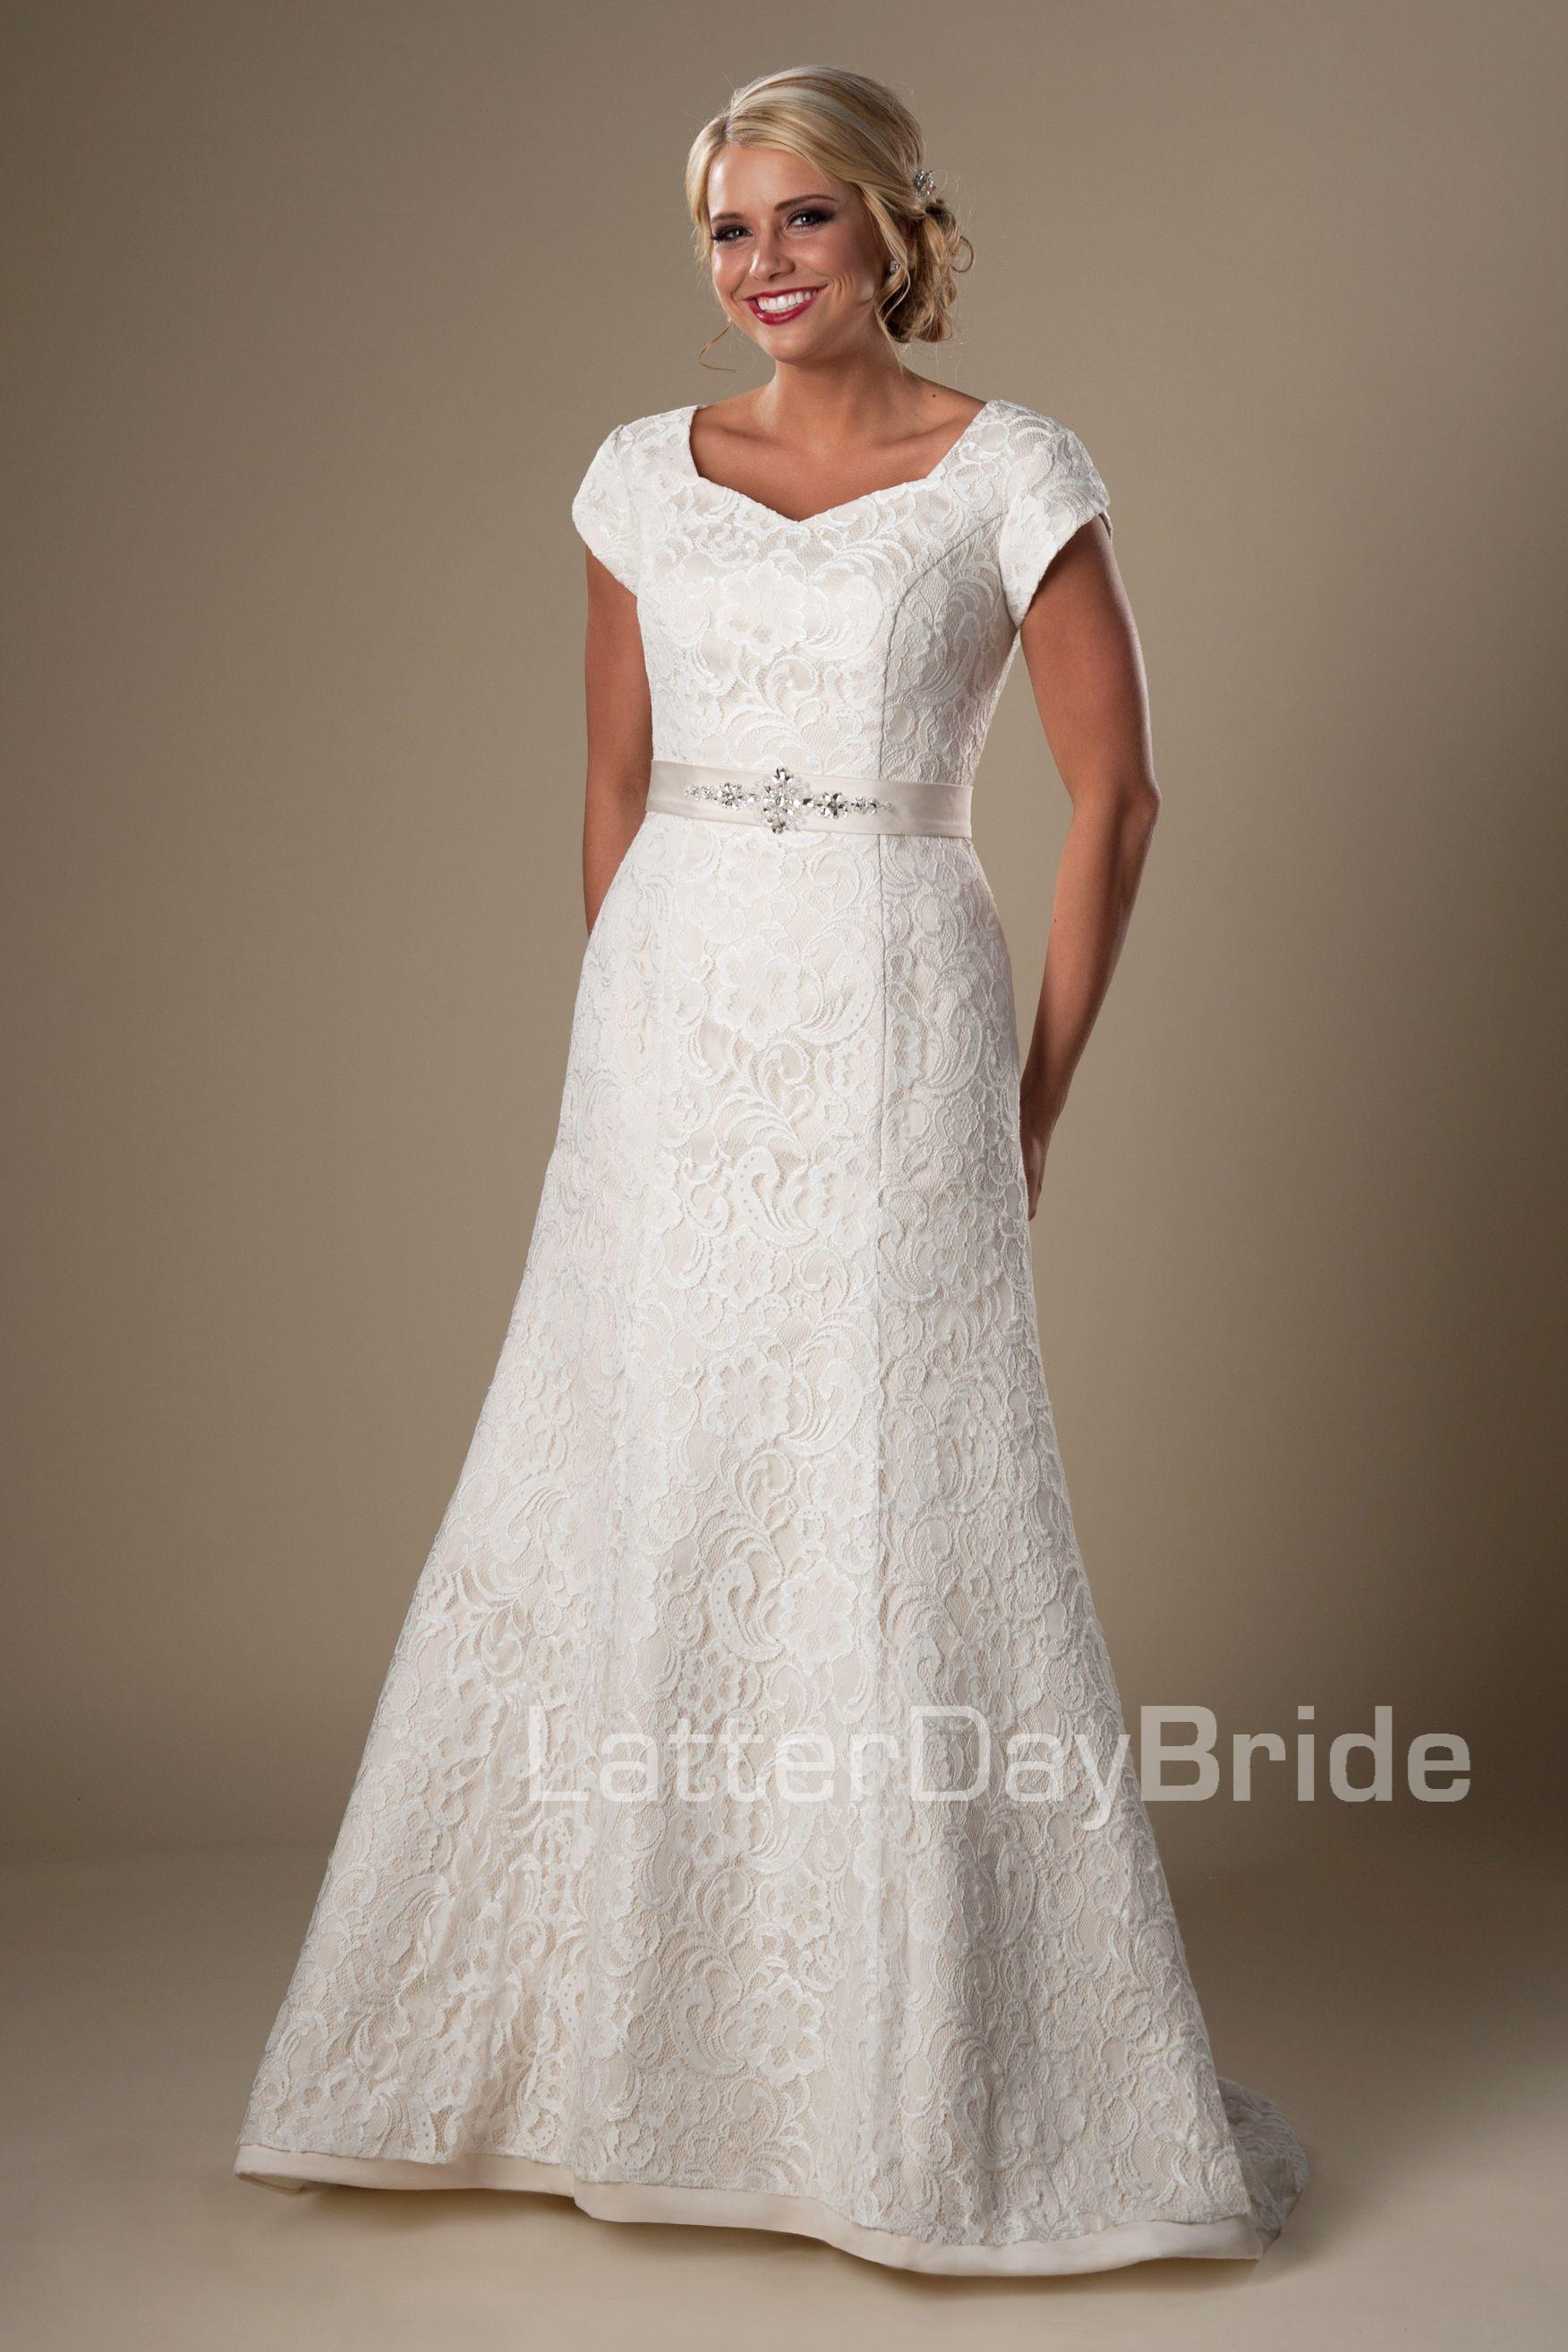 Loveland Modest Wedding Dresses Modest Bridal Gowns Dresses